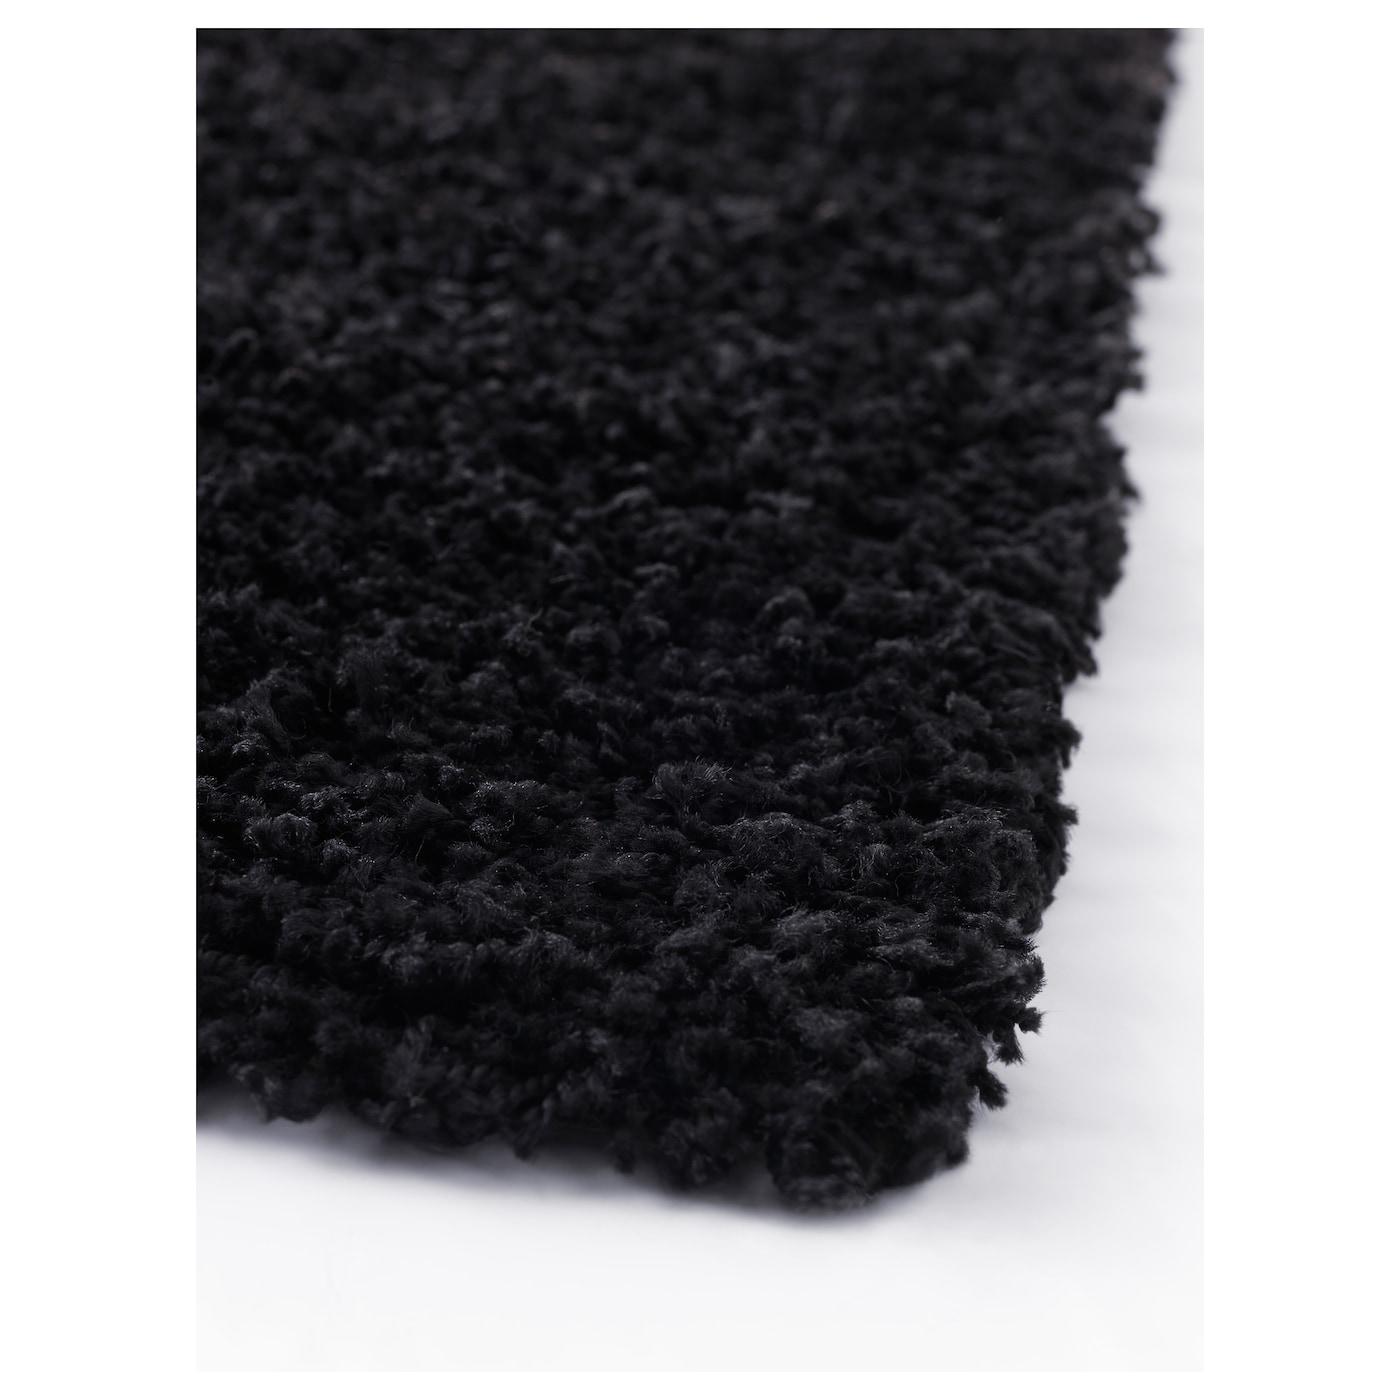 HAMPEN Rug, High Pile Black 80 X 80 Cm